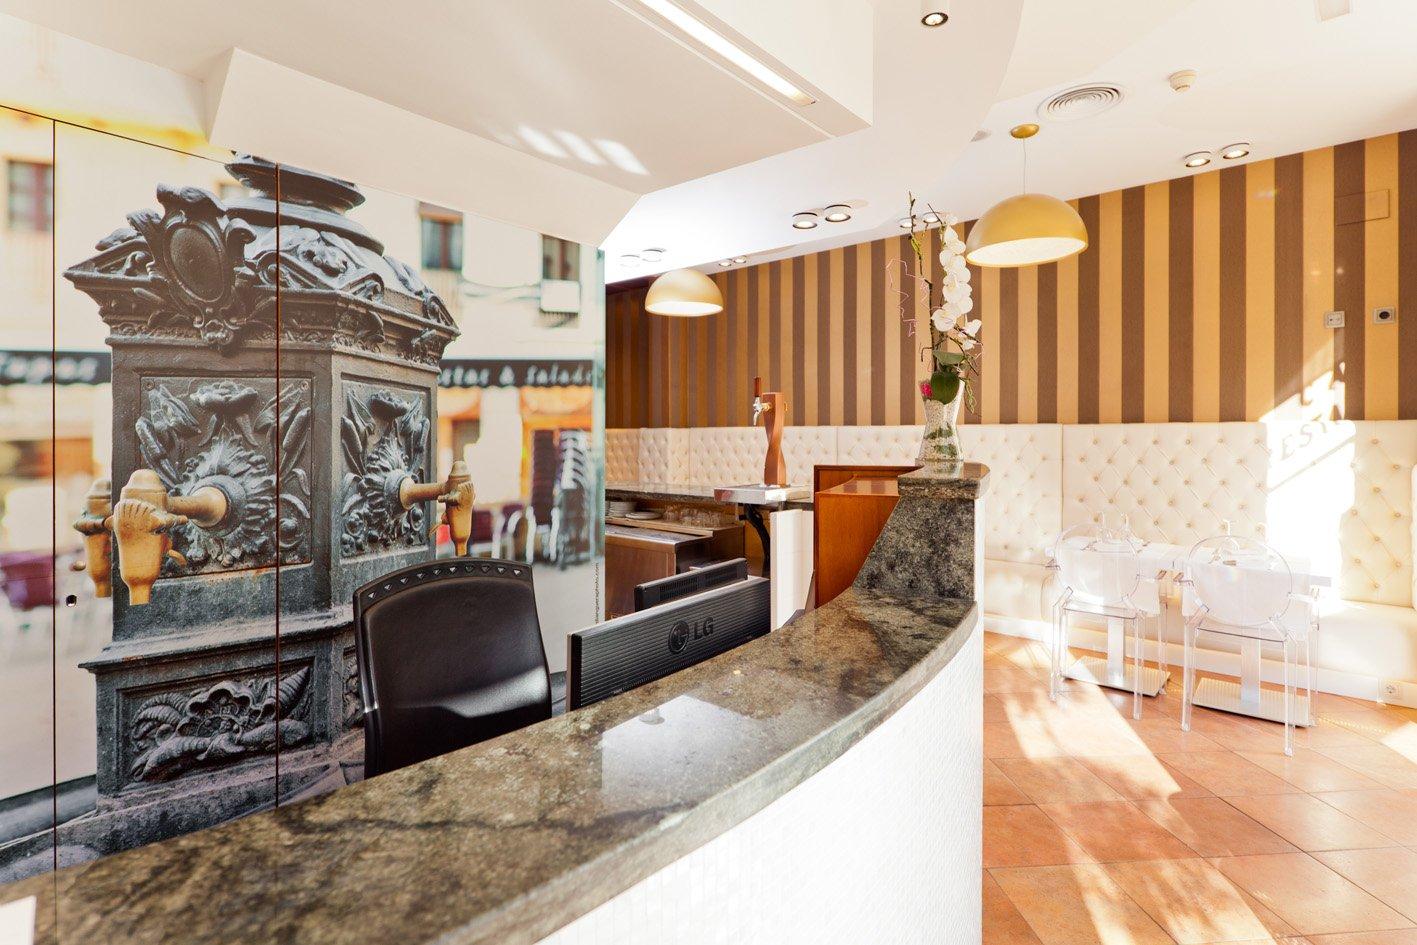 hotel_la_fontnombre_del_documento_20-a41ce8d54344d35c5236c26667f44876